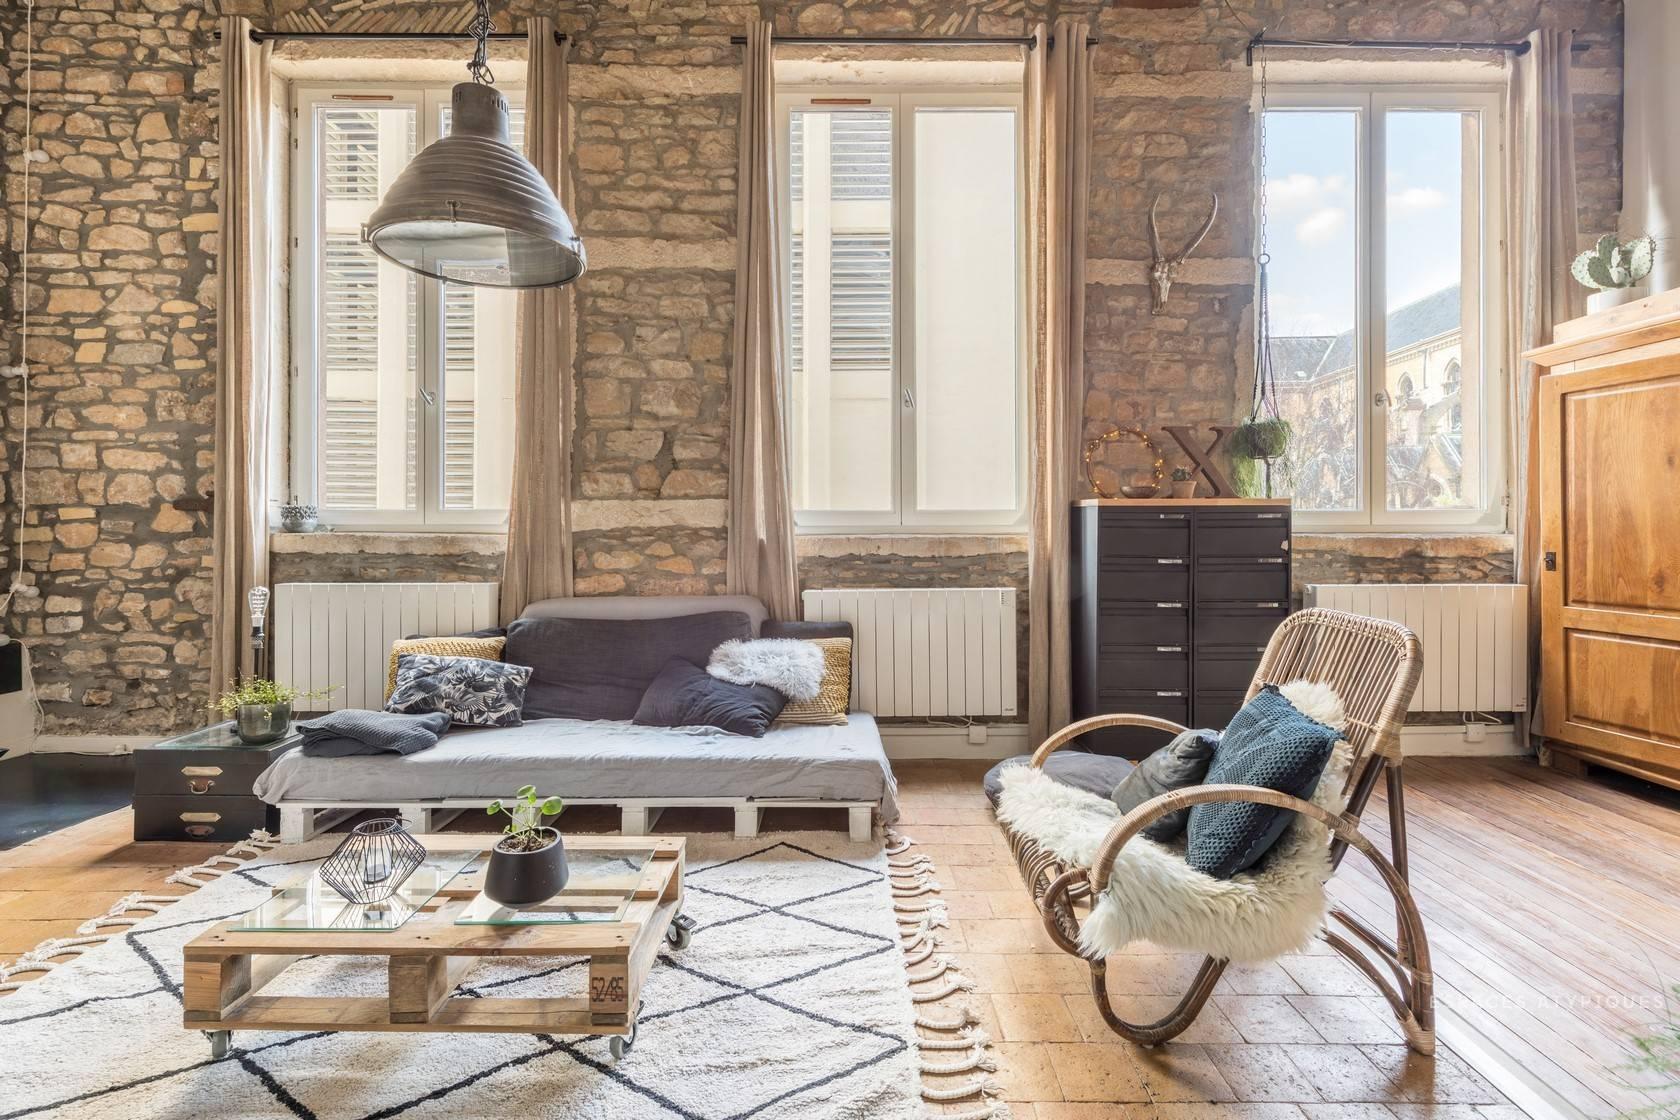 appartement canut rénovation